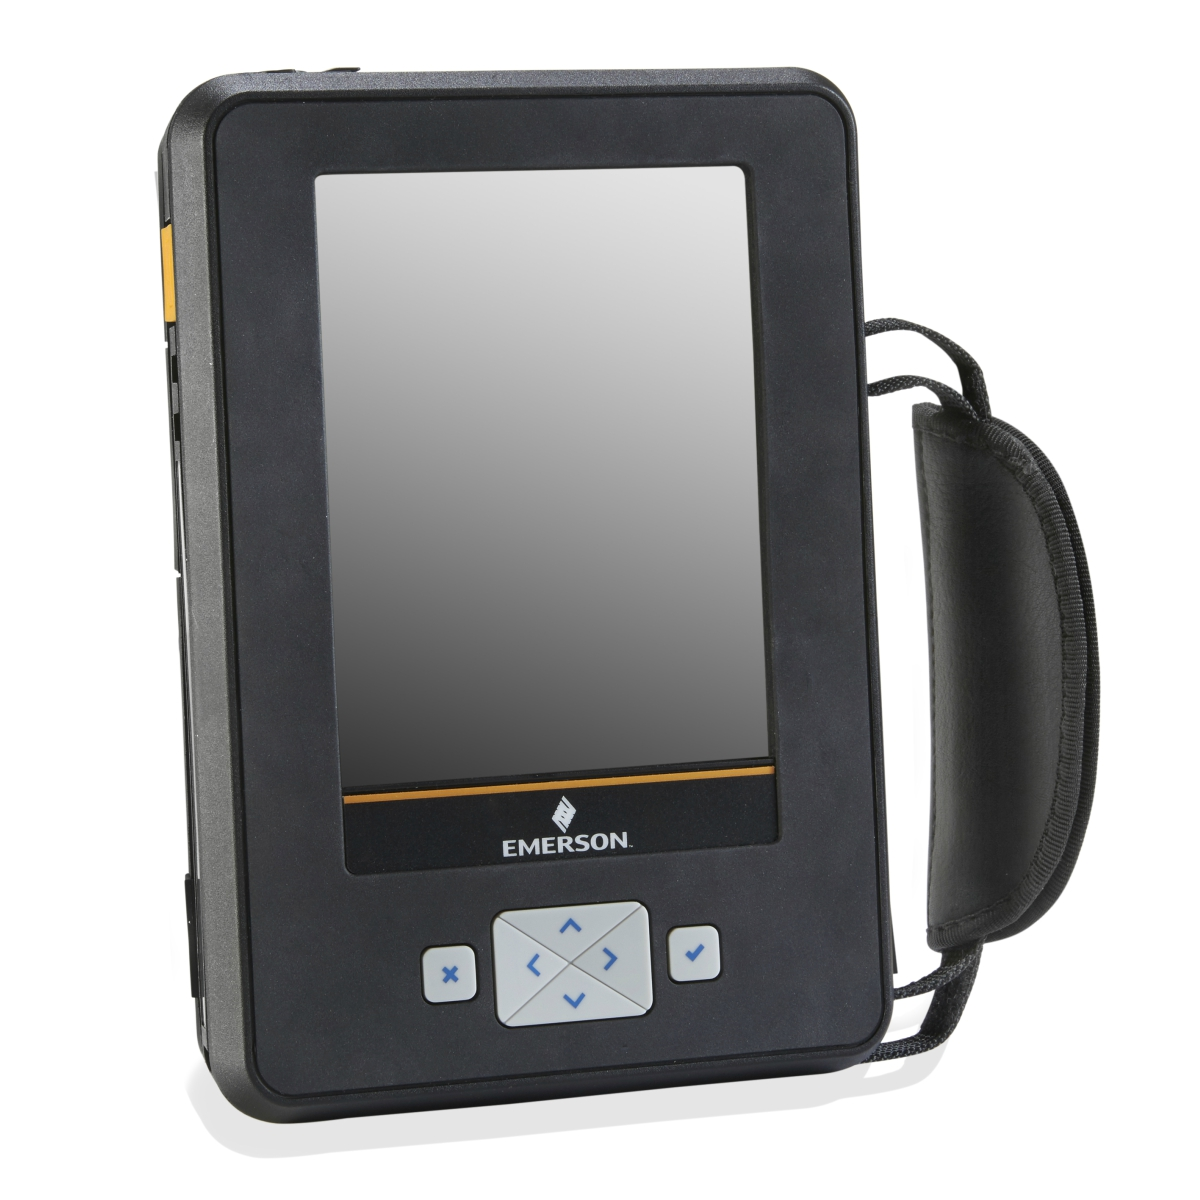 ams trex device communicator trexchpklws3 emerson bhd. Black Bedroom Furniture Sets. Home Design Ideas